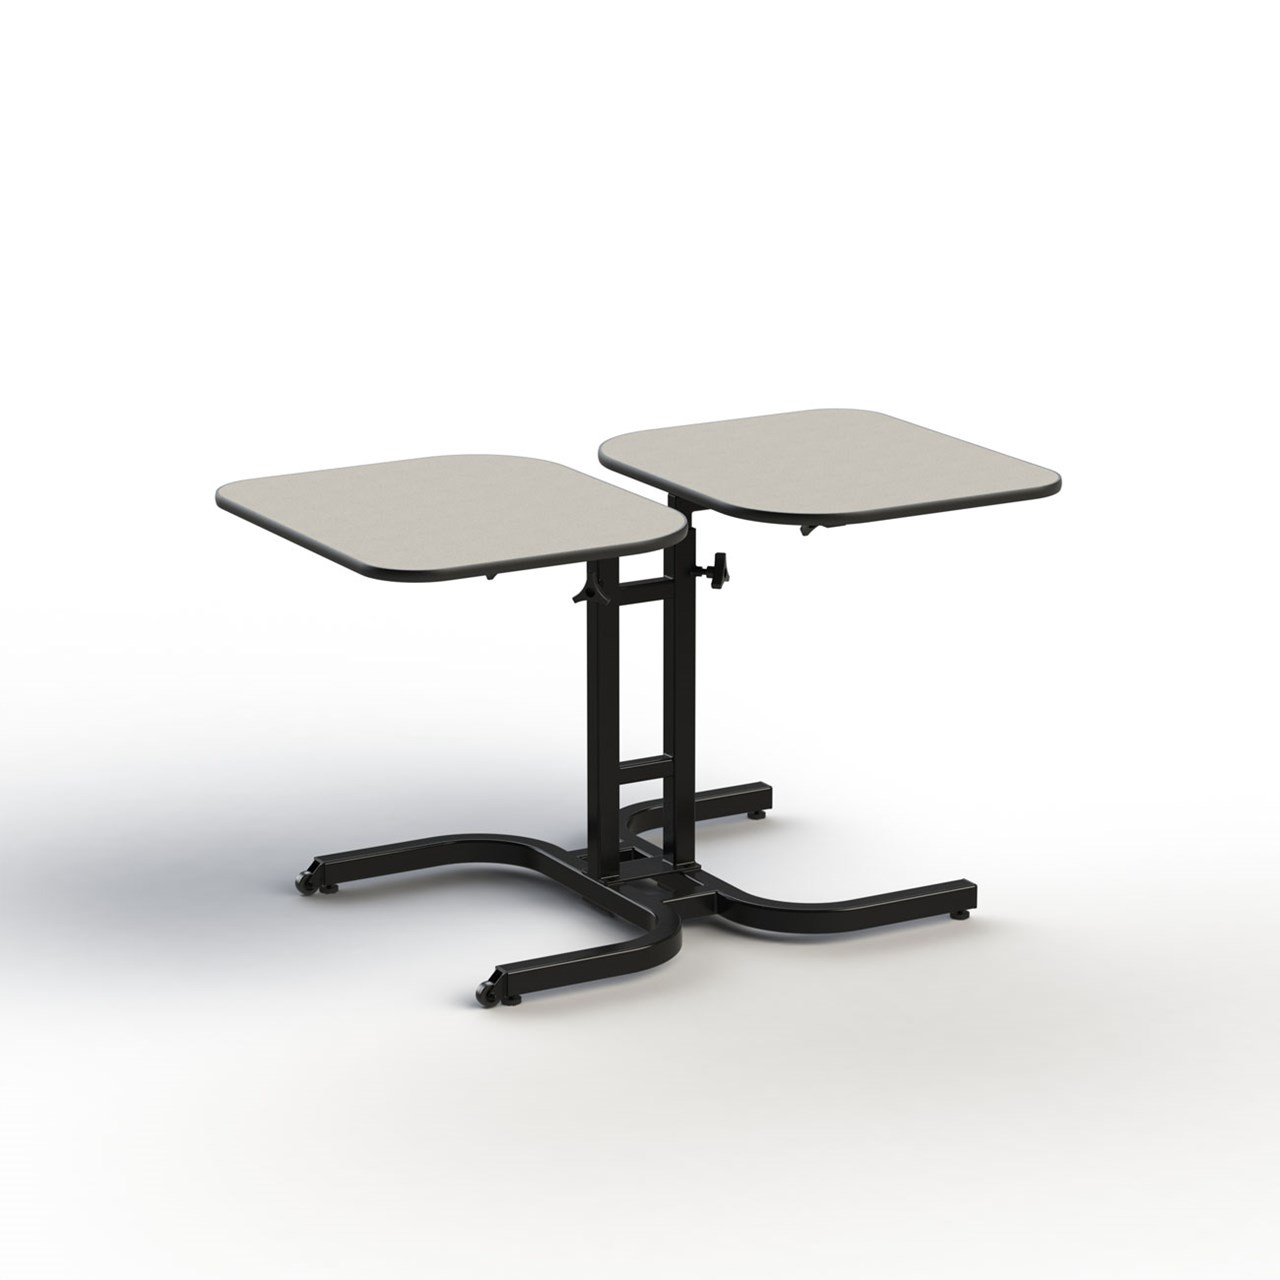 Maxiaids Accessible Desks Tables Adjustable